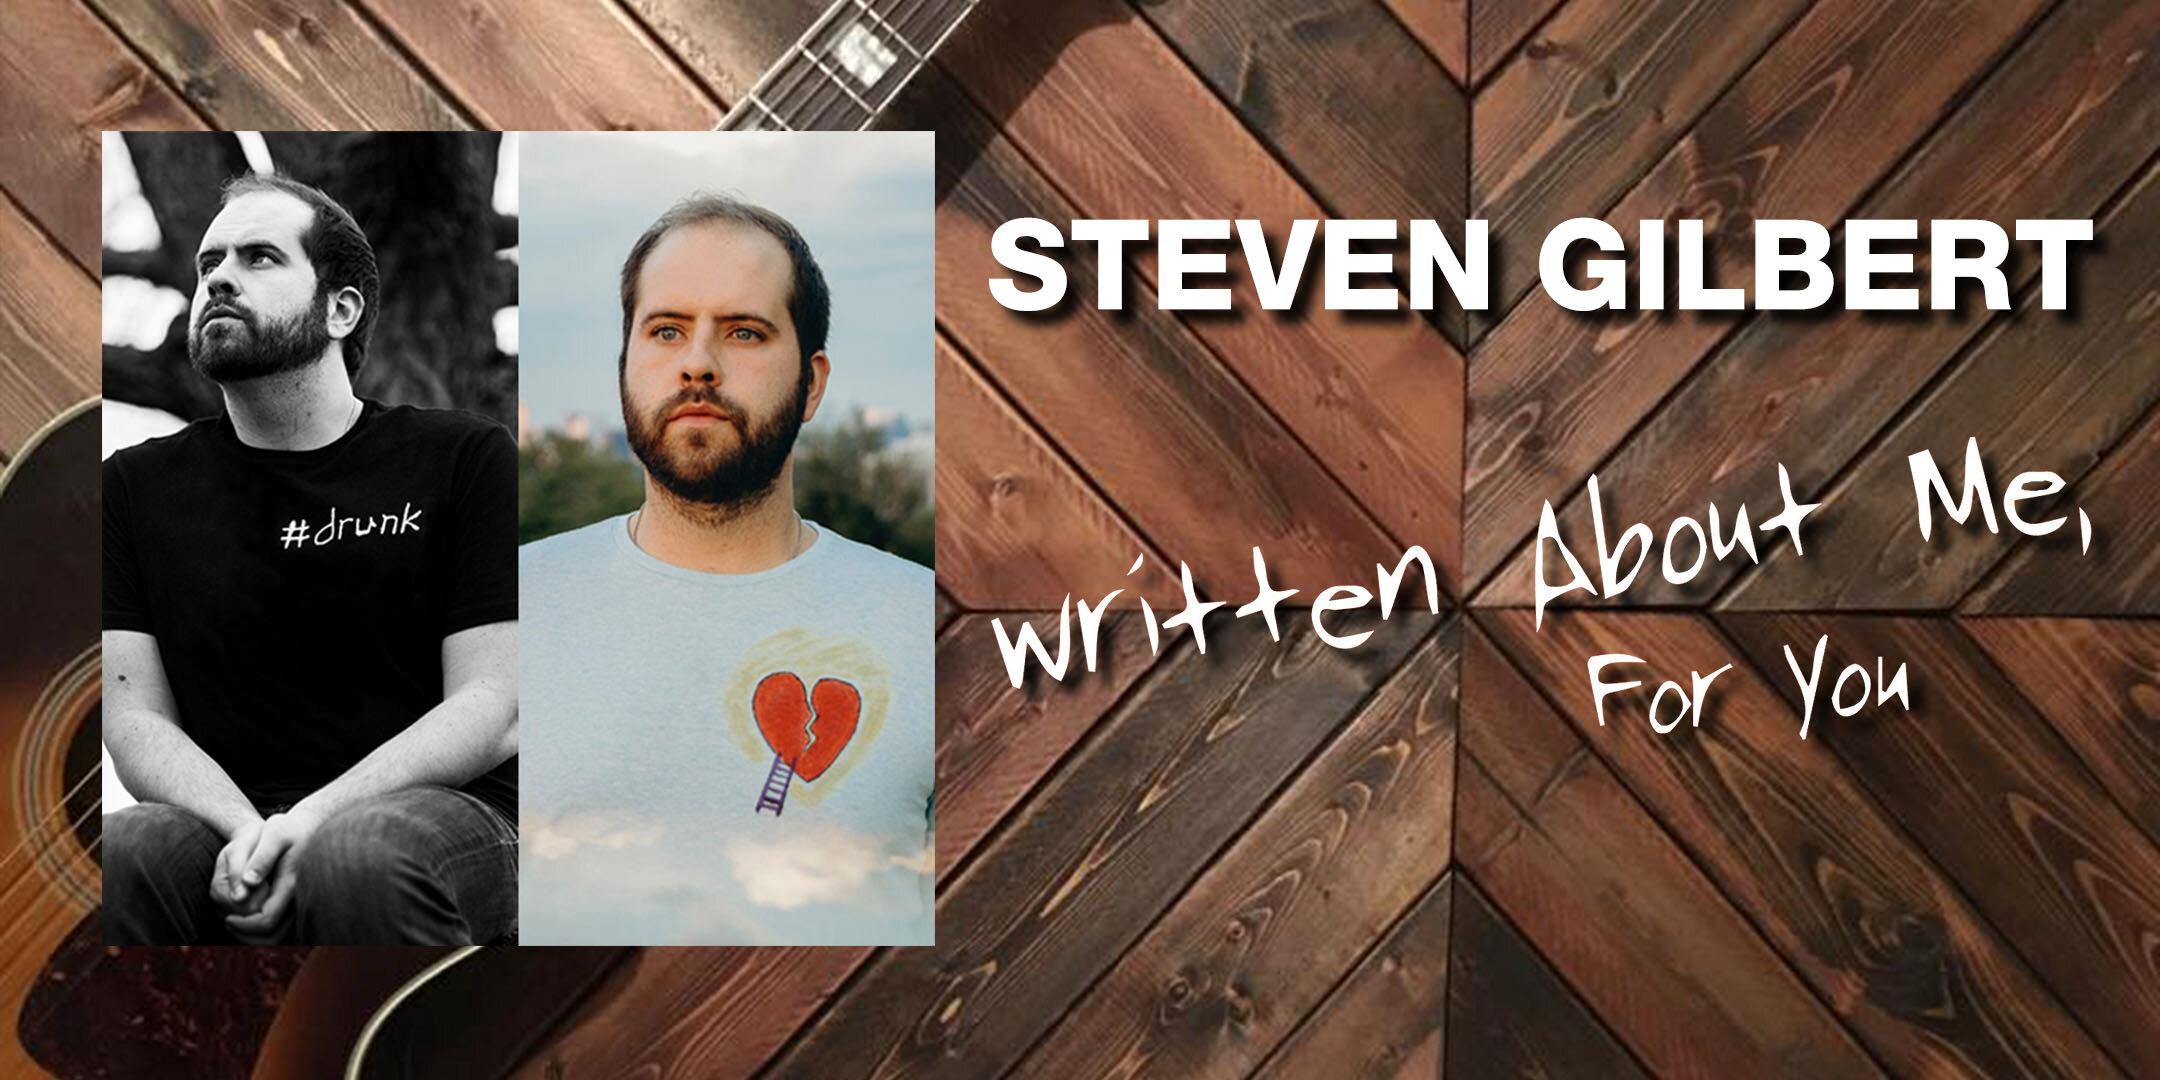 Steven Gilbert's Written About Me, for You Tour — October 21, 2019 — Red Light Café, Atlanta, GA